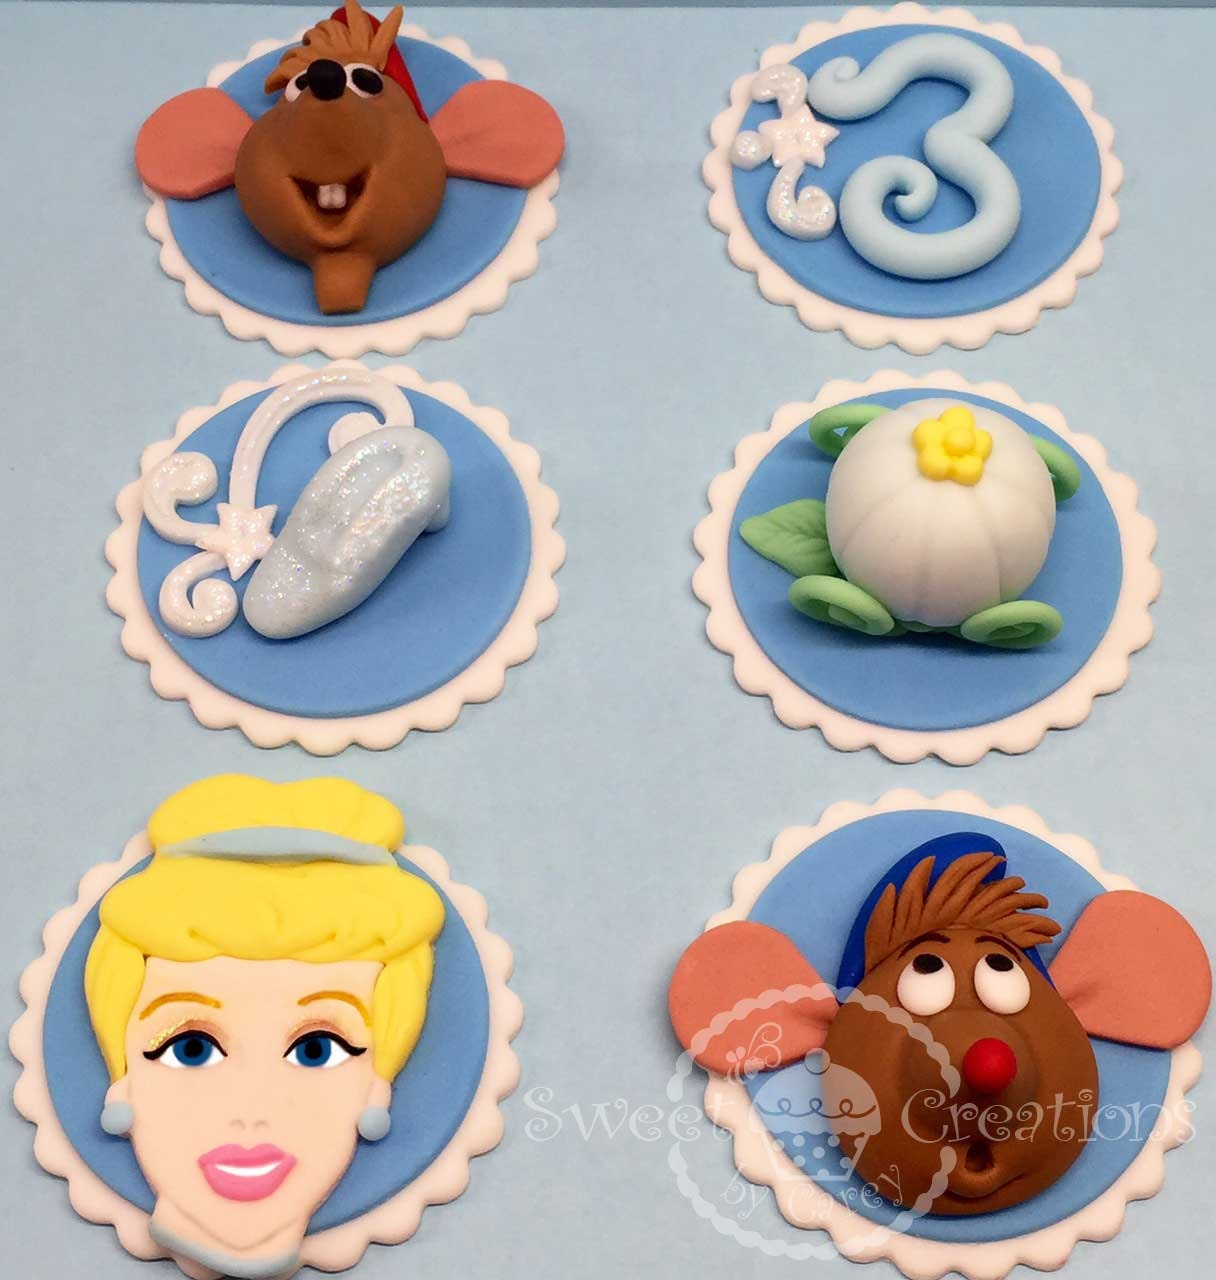 Fondant princess Cinderella cupcake toppers